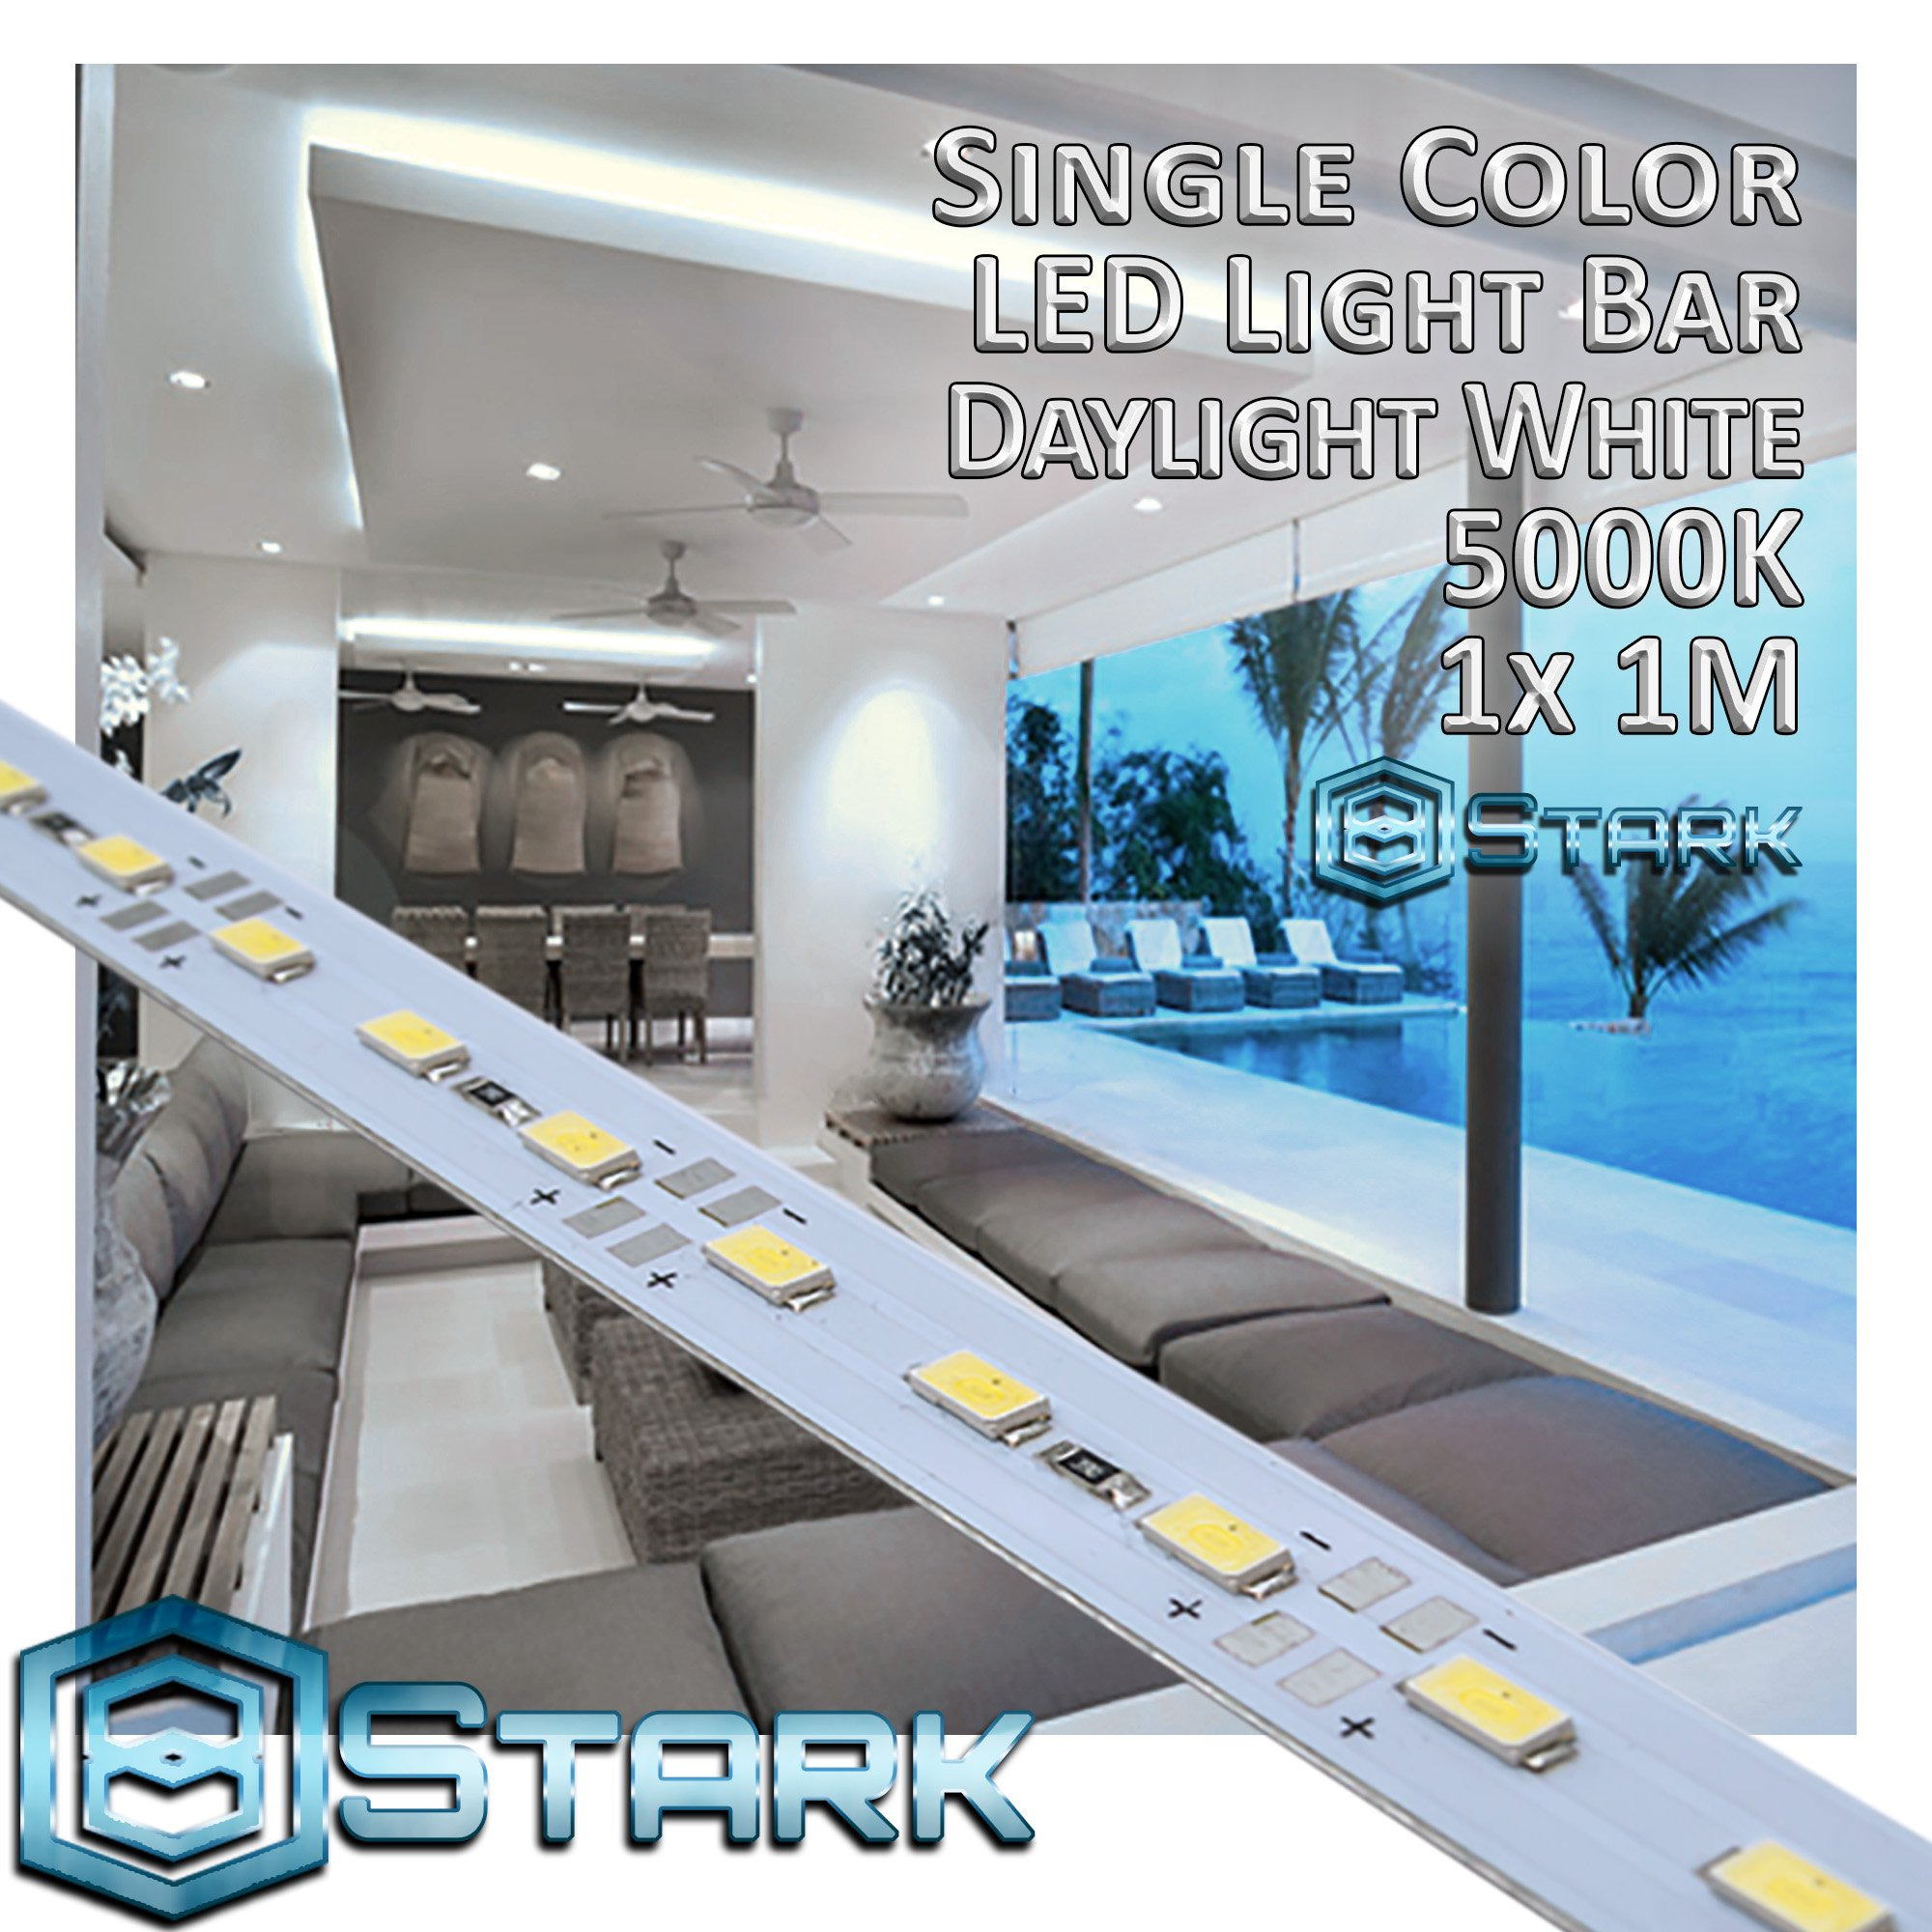 Aluminum LED Solid Strips - Interior Design Lighting - Daylight - 5000K - 1 Set (1M/3.3FT)